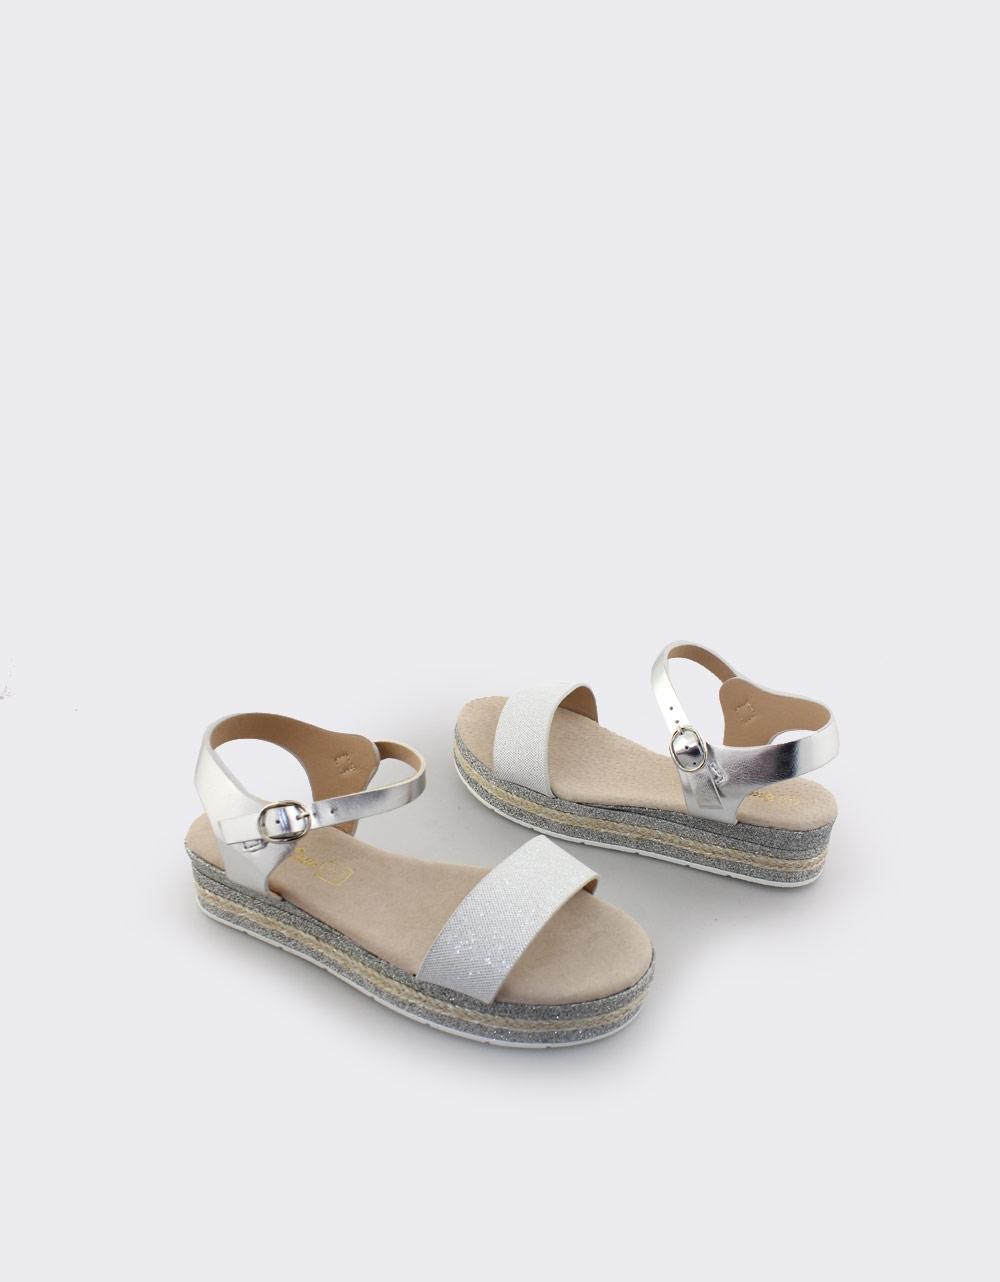 1030f3a9d9c Inshoes.gr. Παιδικά πέδιλα με μεταλλιζέ λεπτομέρειες | InShoes.gr Ασημί